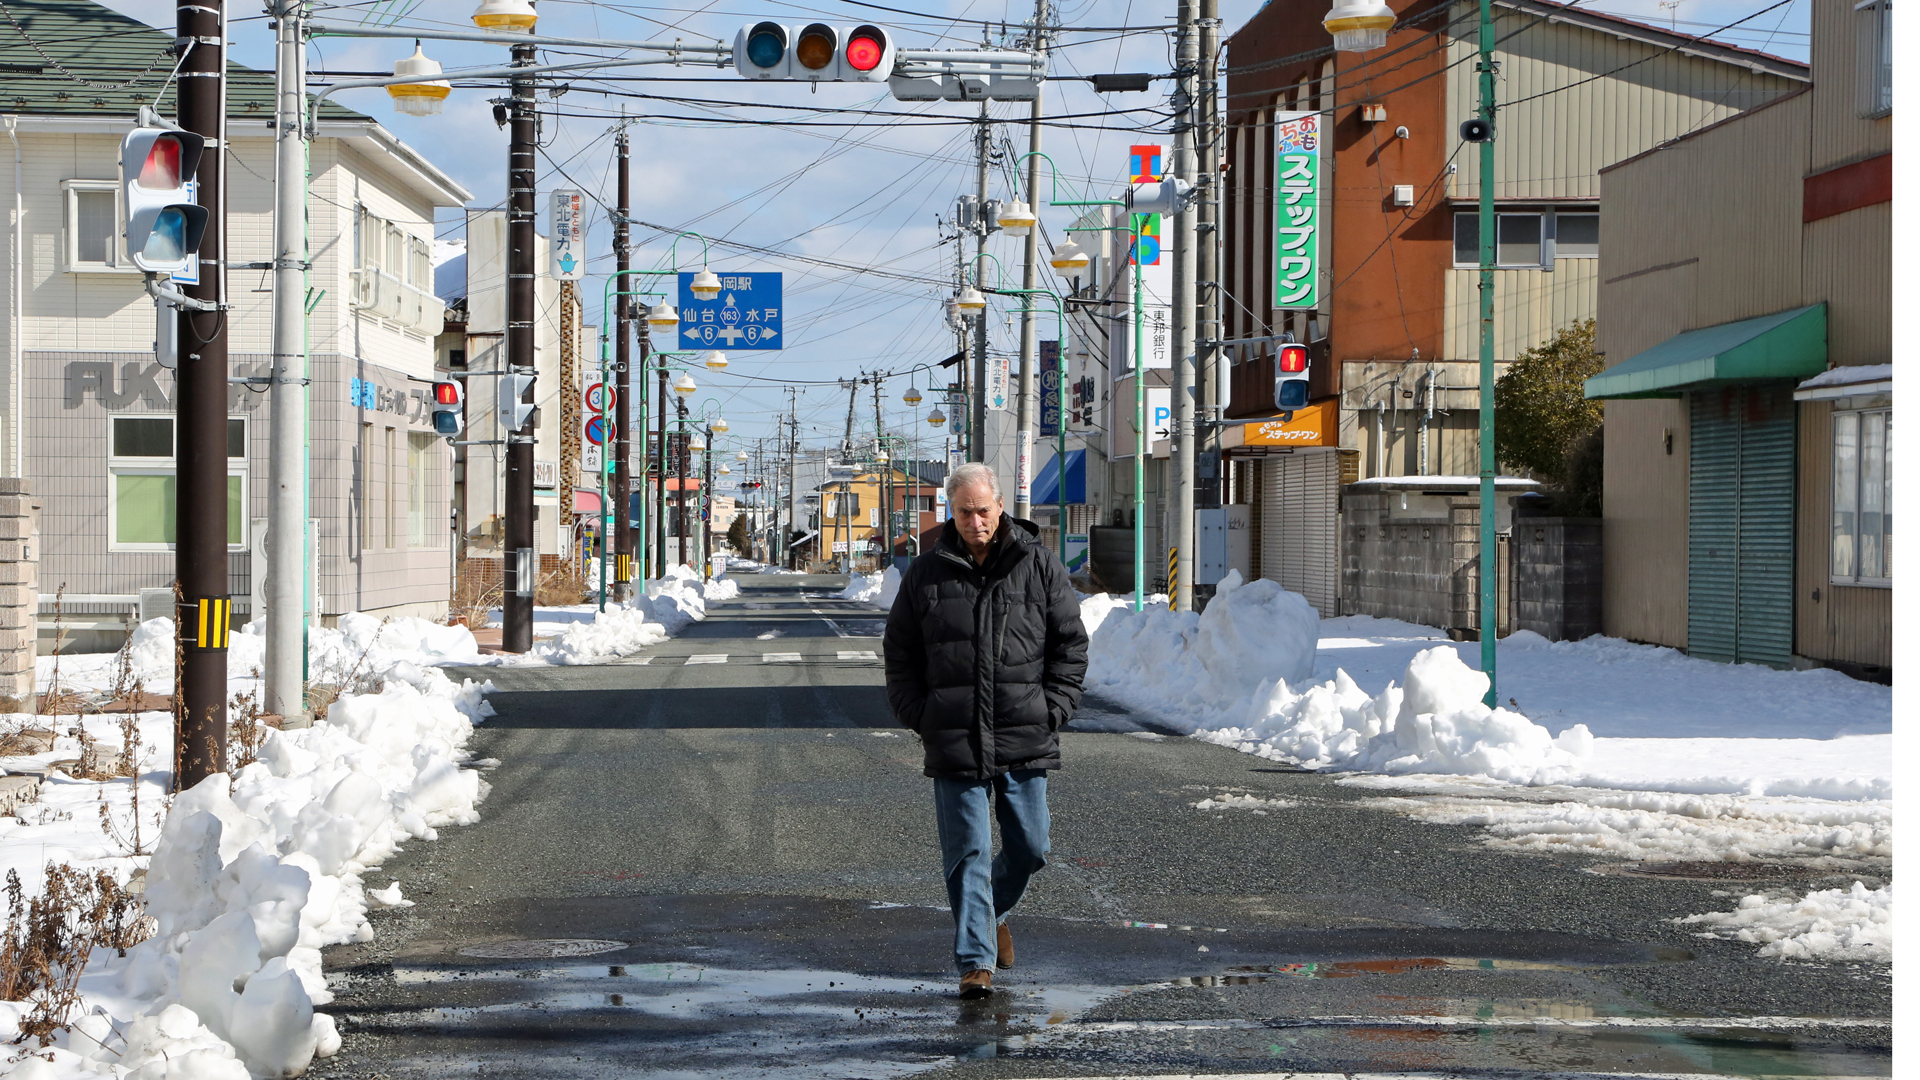 Fukushima: Three years later - CBS News